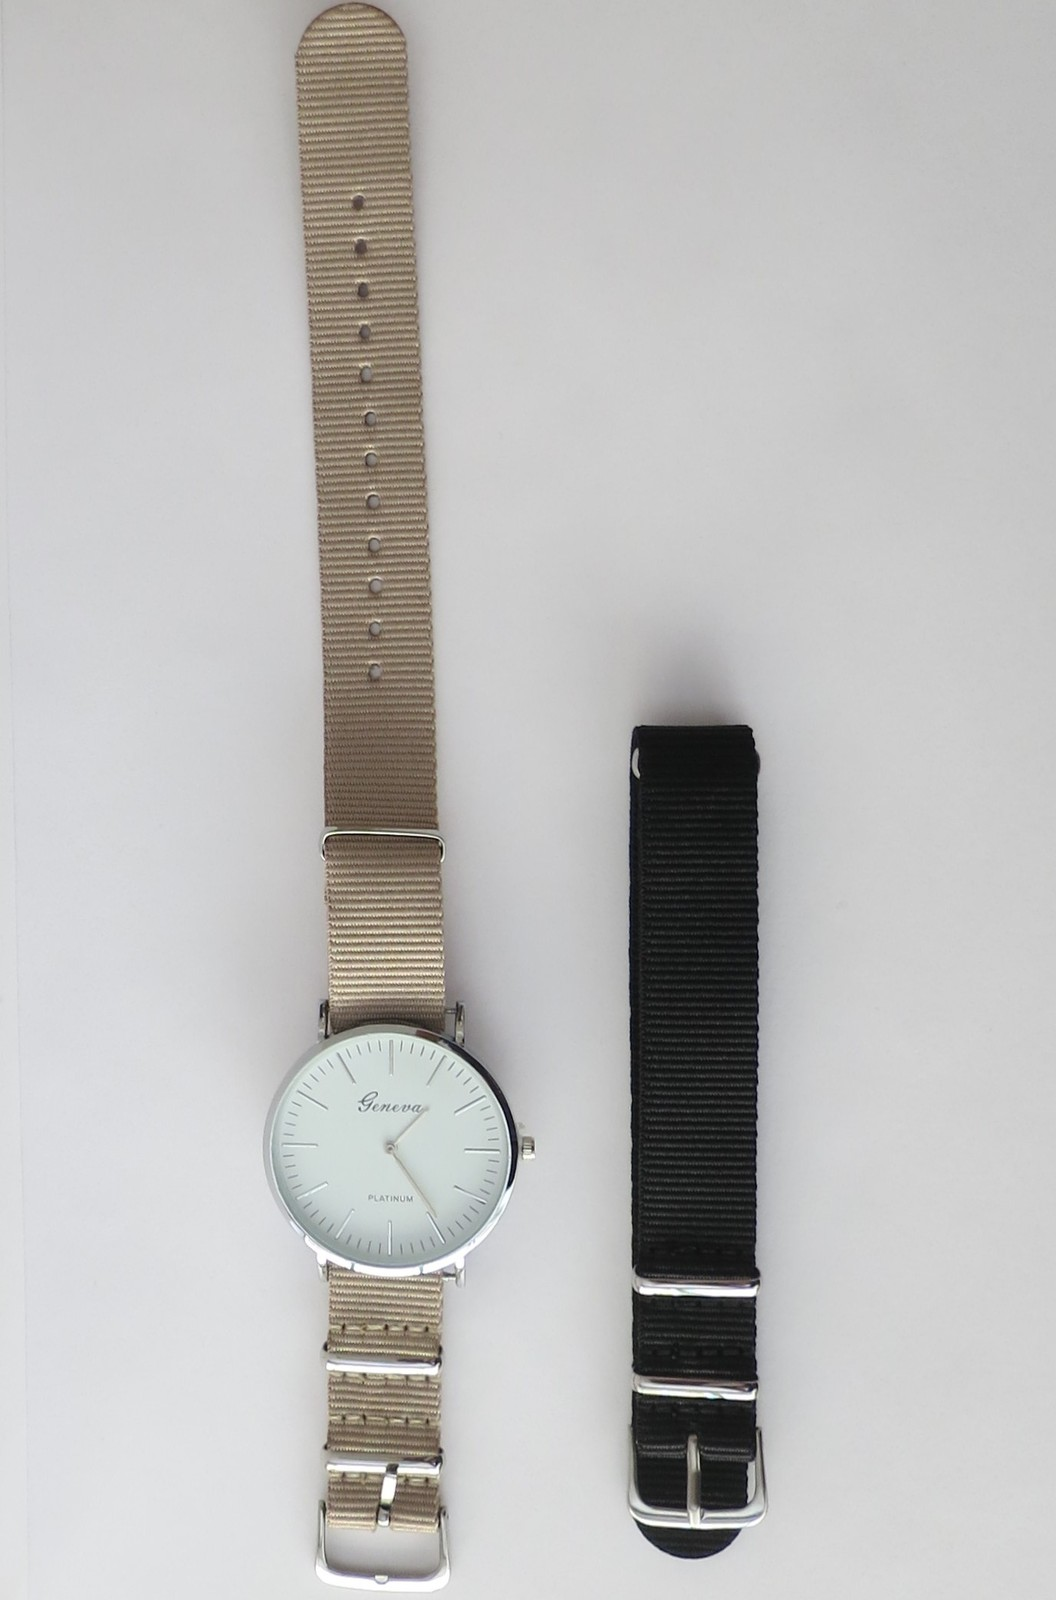 Watch for woman. Minimalist women's watch. Big wrist watch. Watch with two bands